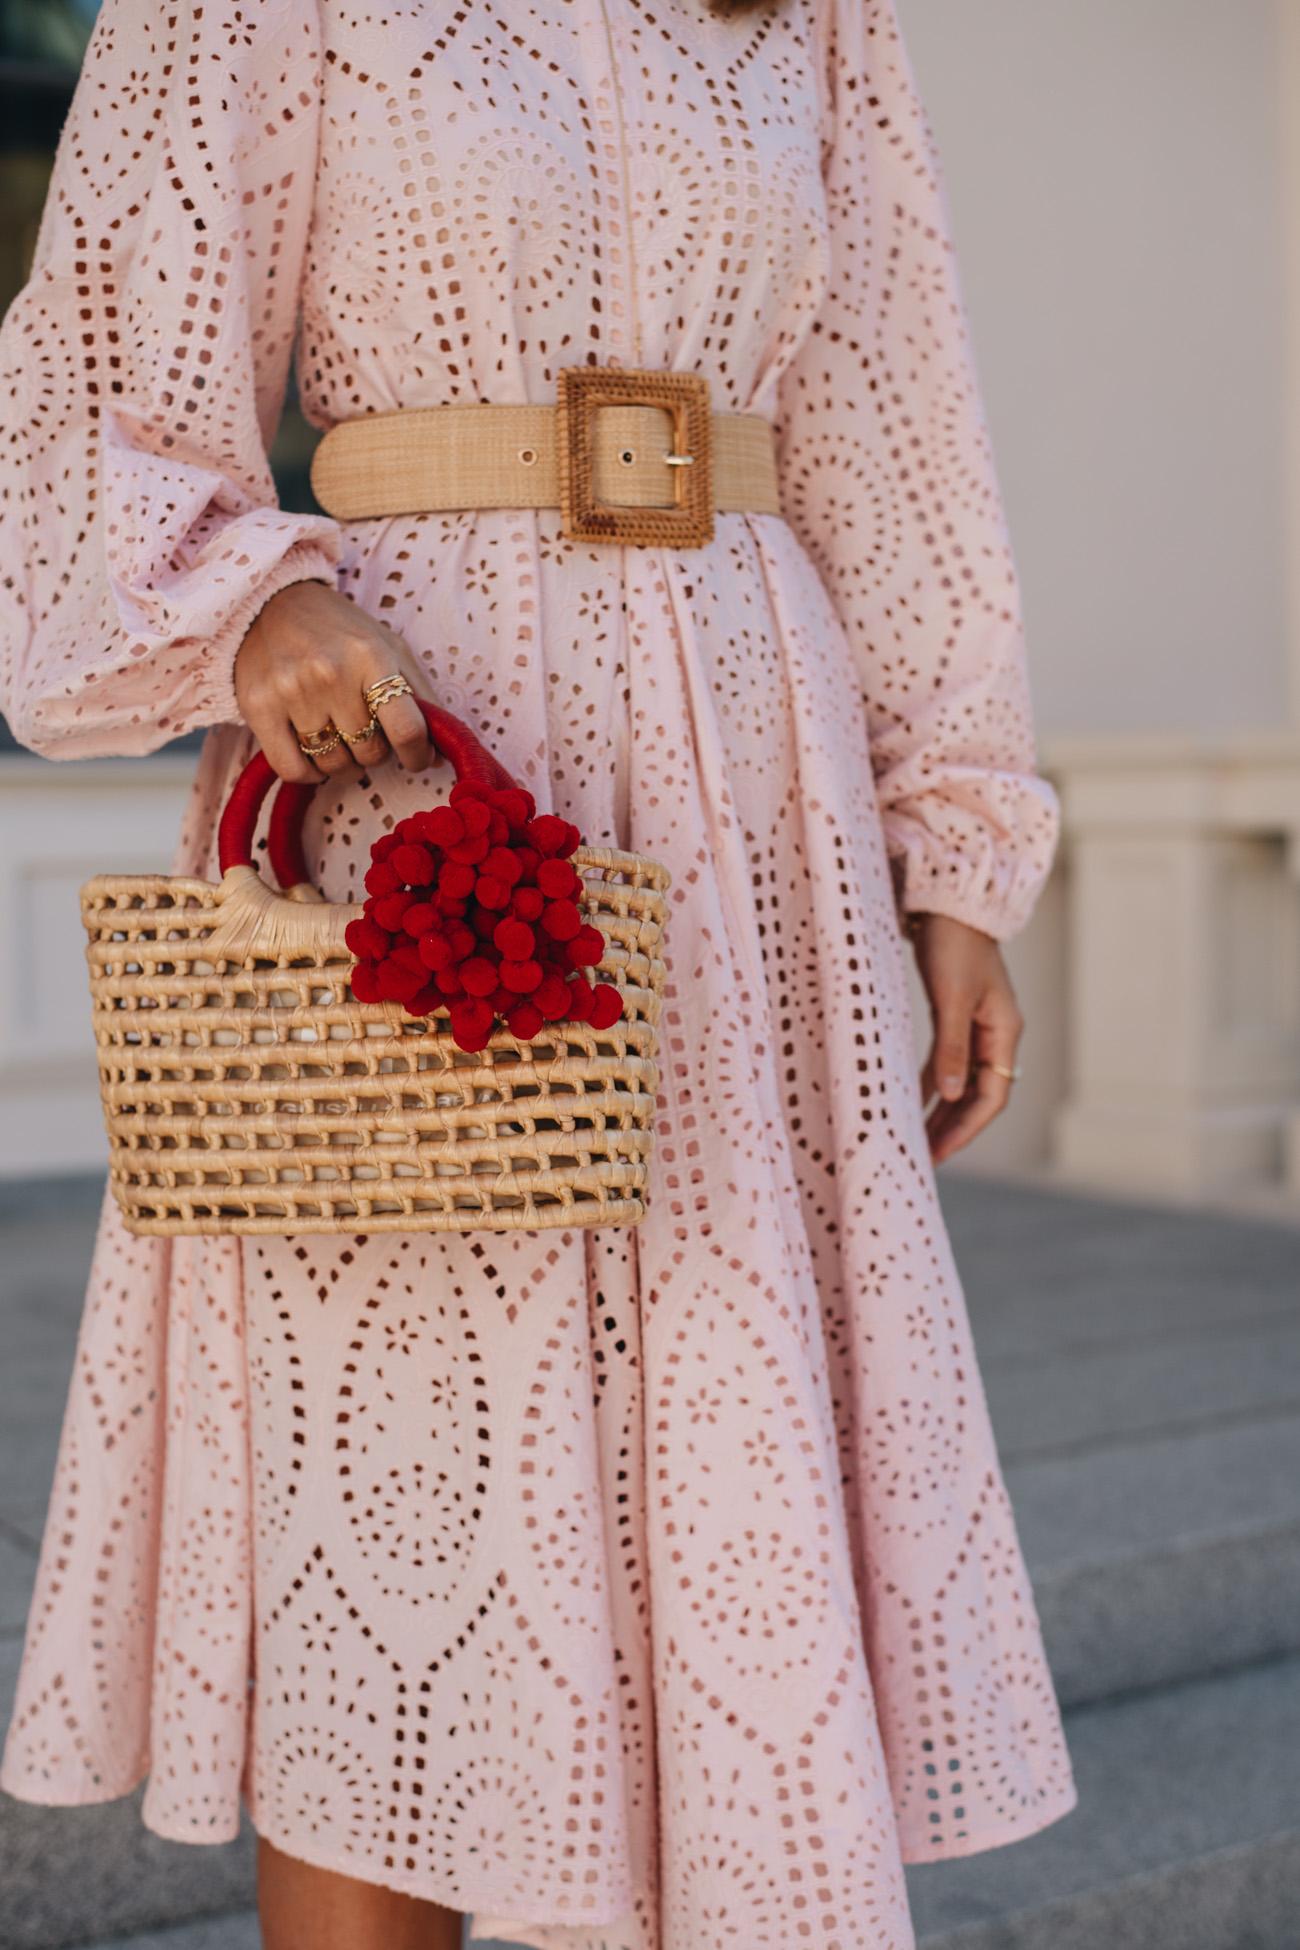 Korb Handtasche mit Pom Pom Details